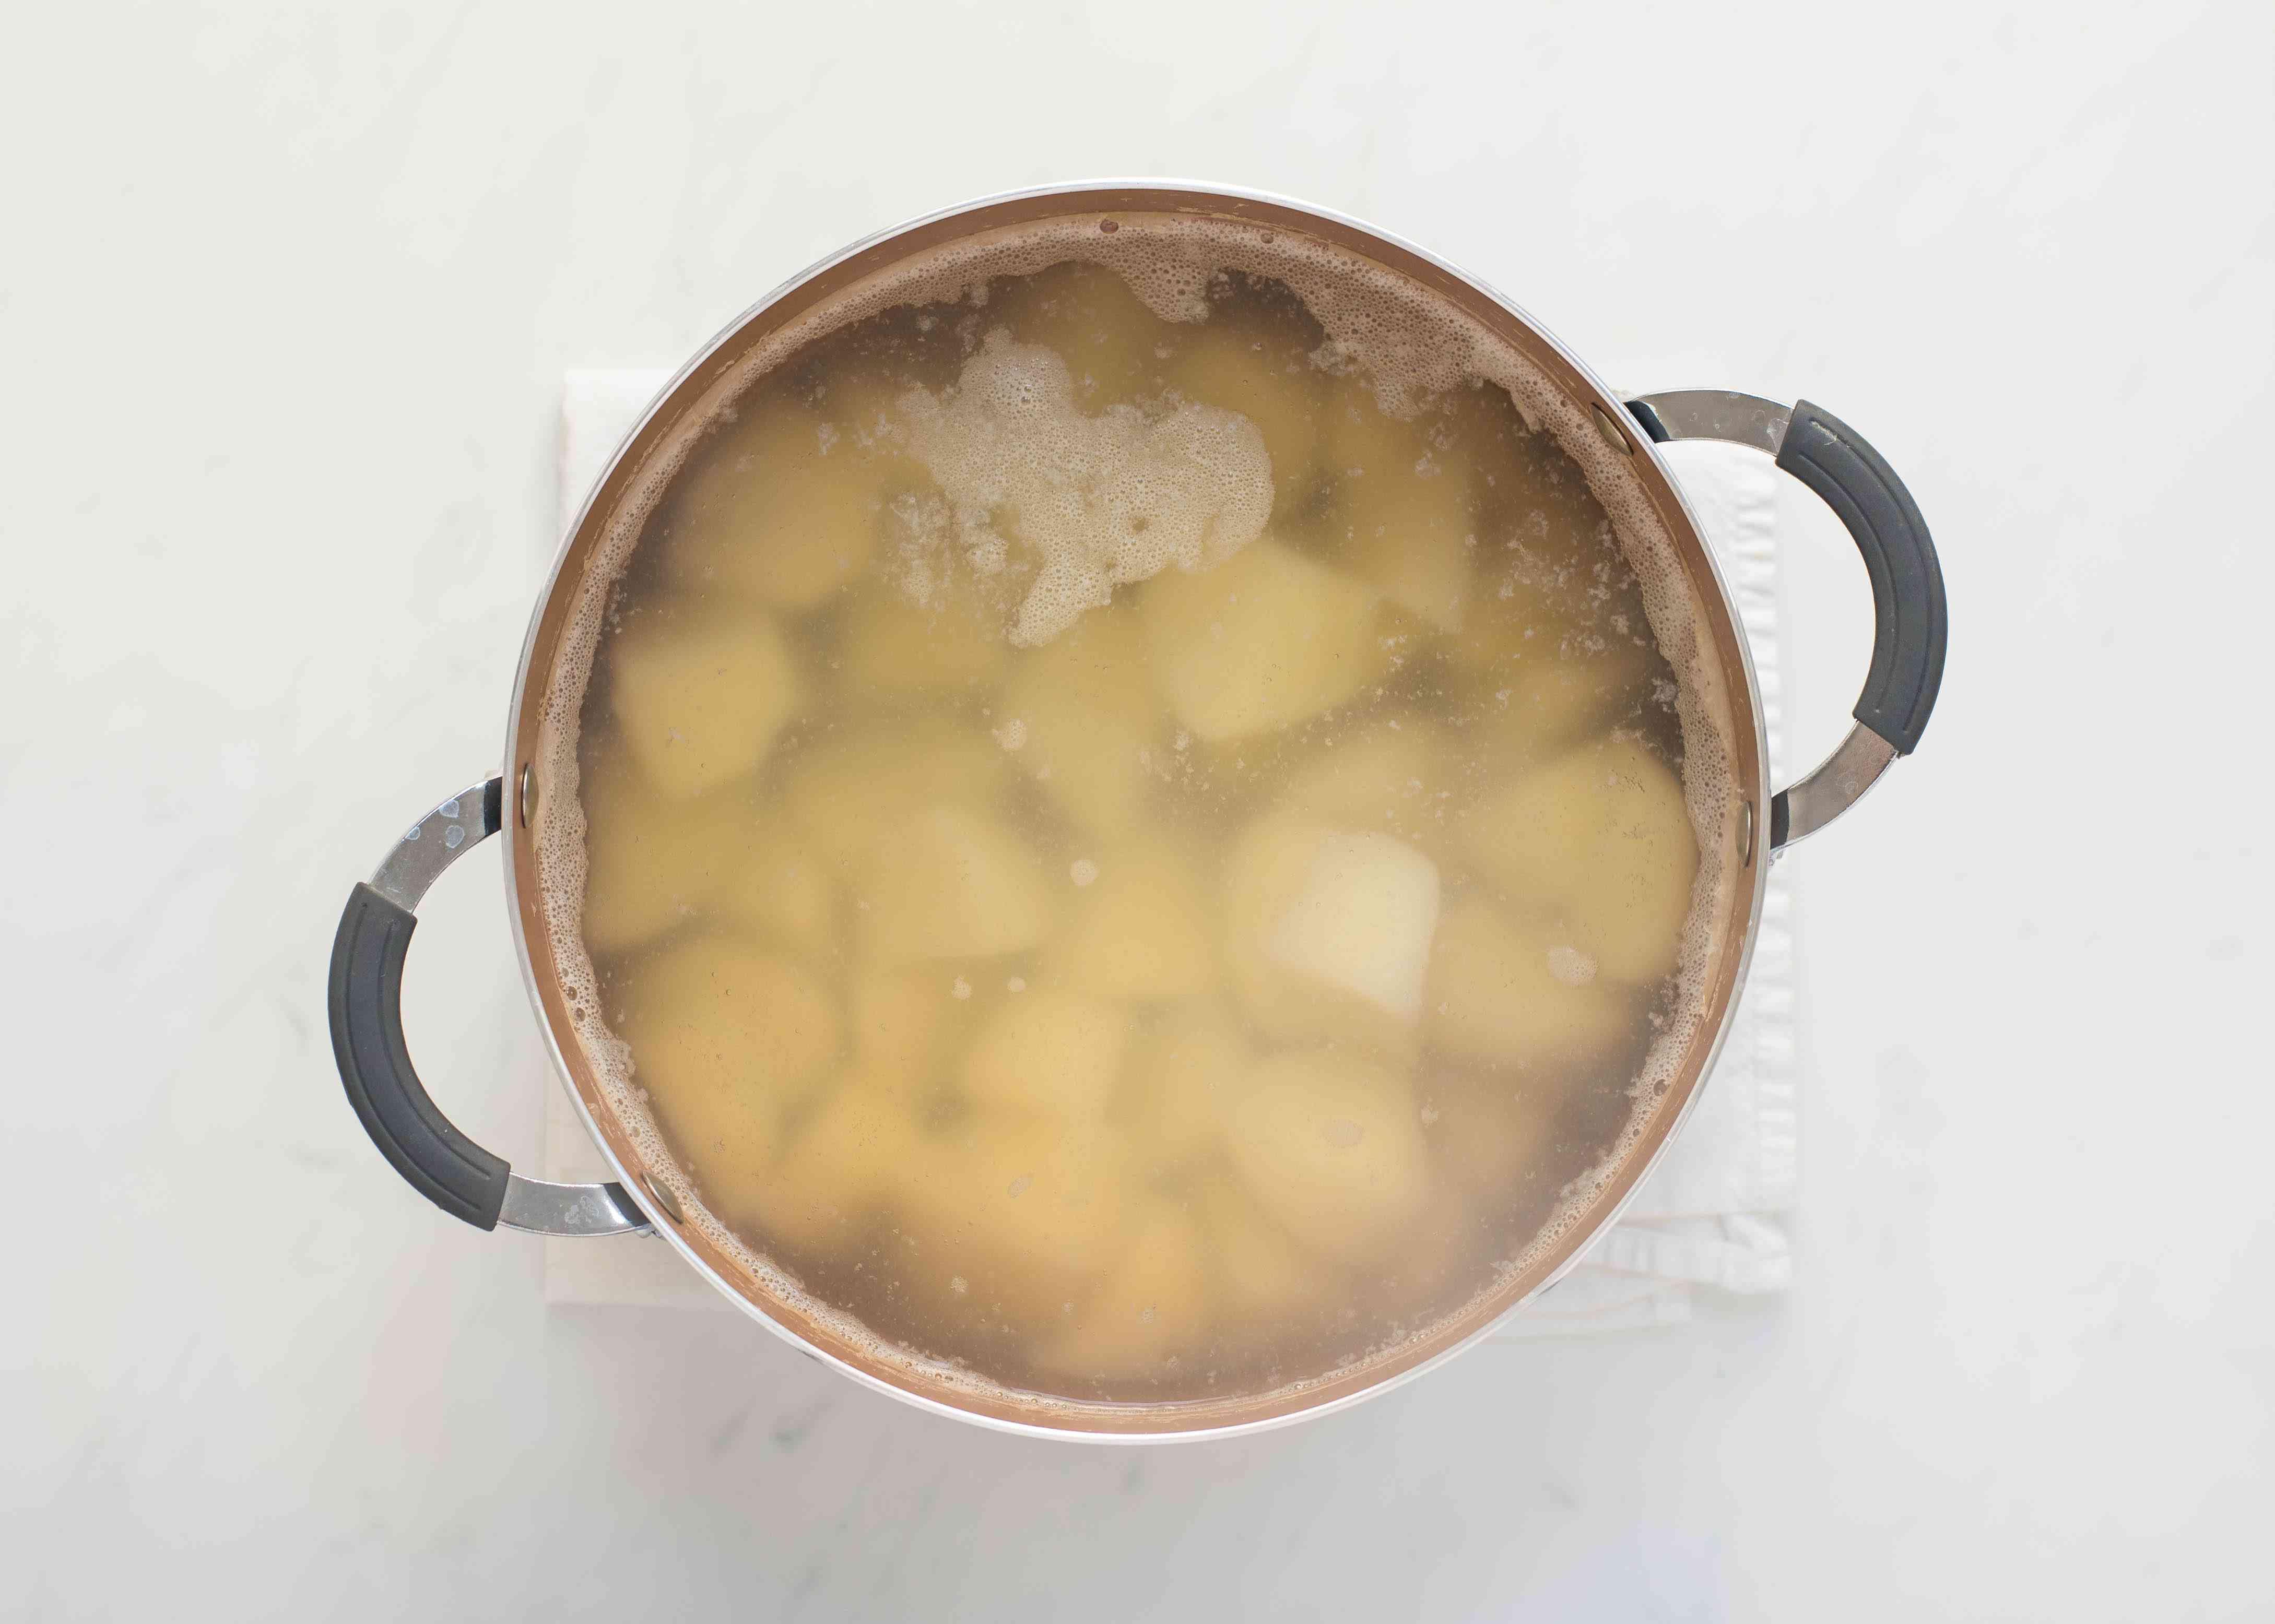 Slow cook potatoes